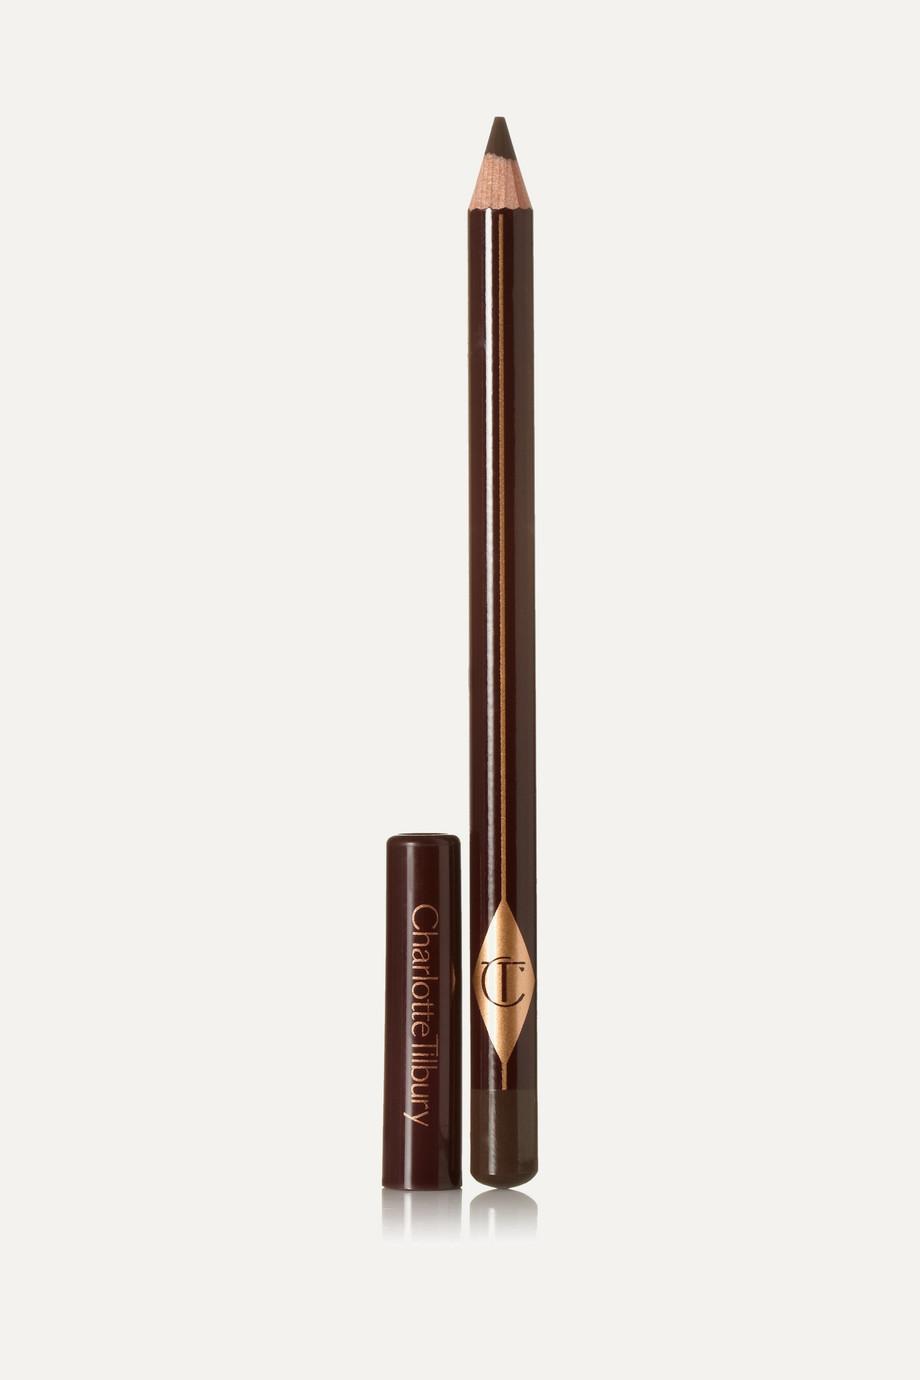 Charlotte Tilbury The Classic Eye Powder Pencil - Classic Brown